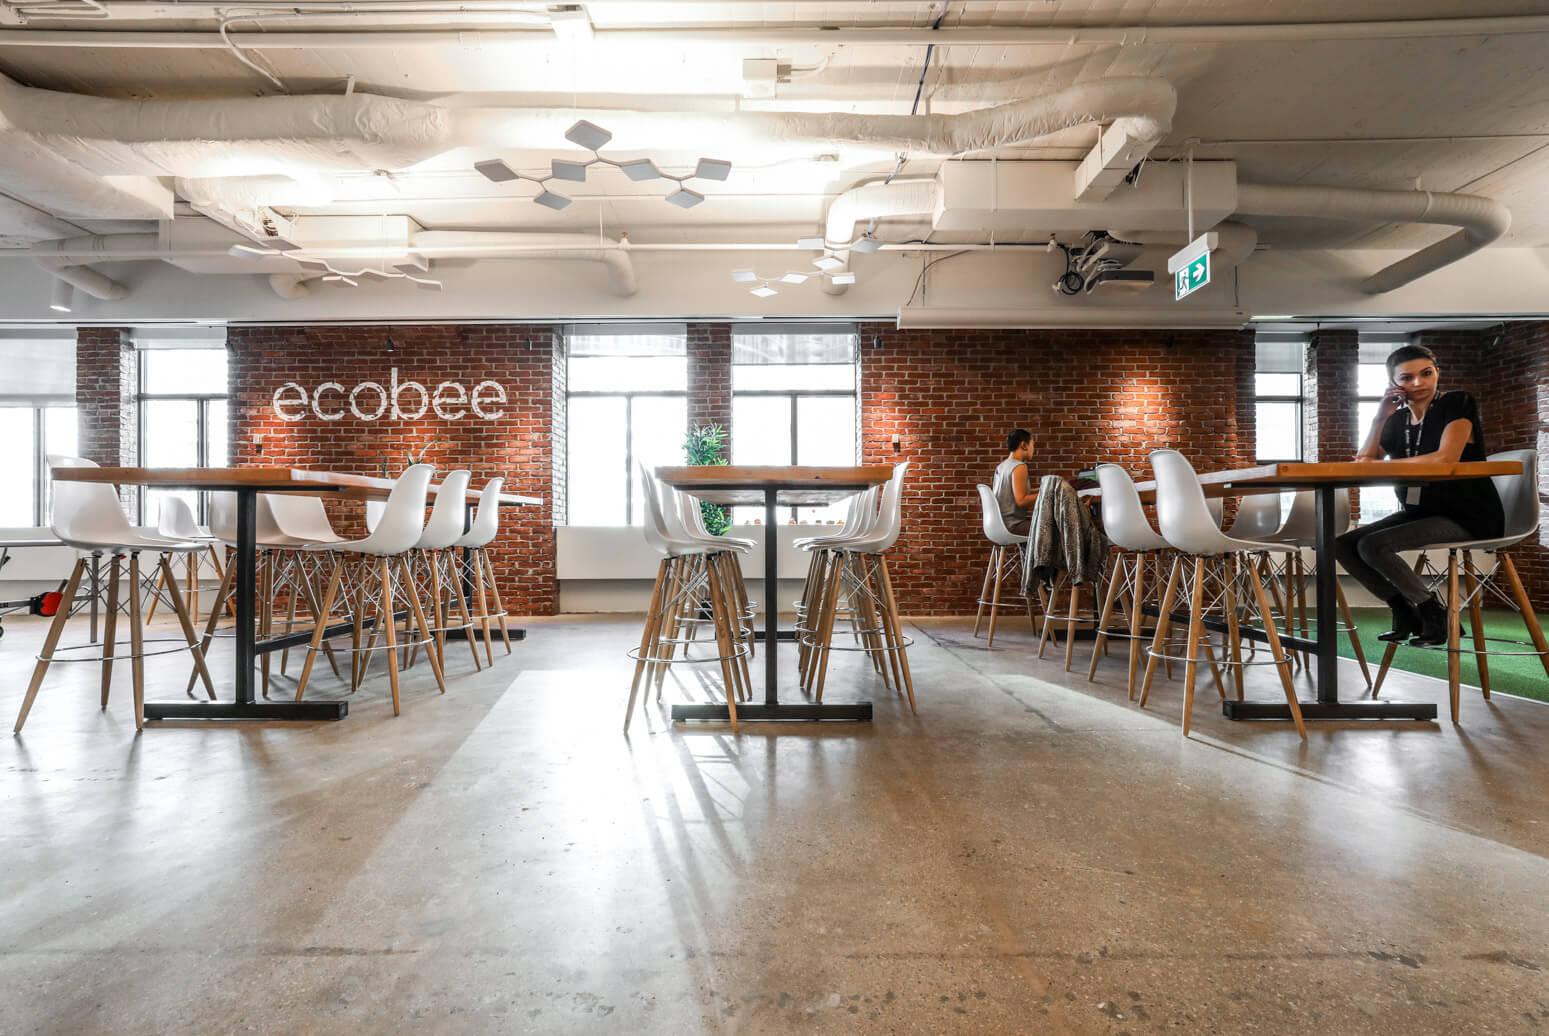 Ecobee Toronto Office Killer Spaces-11